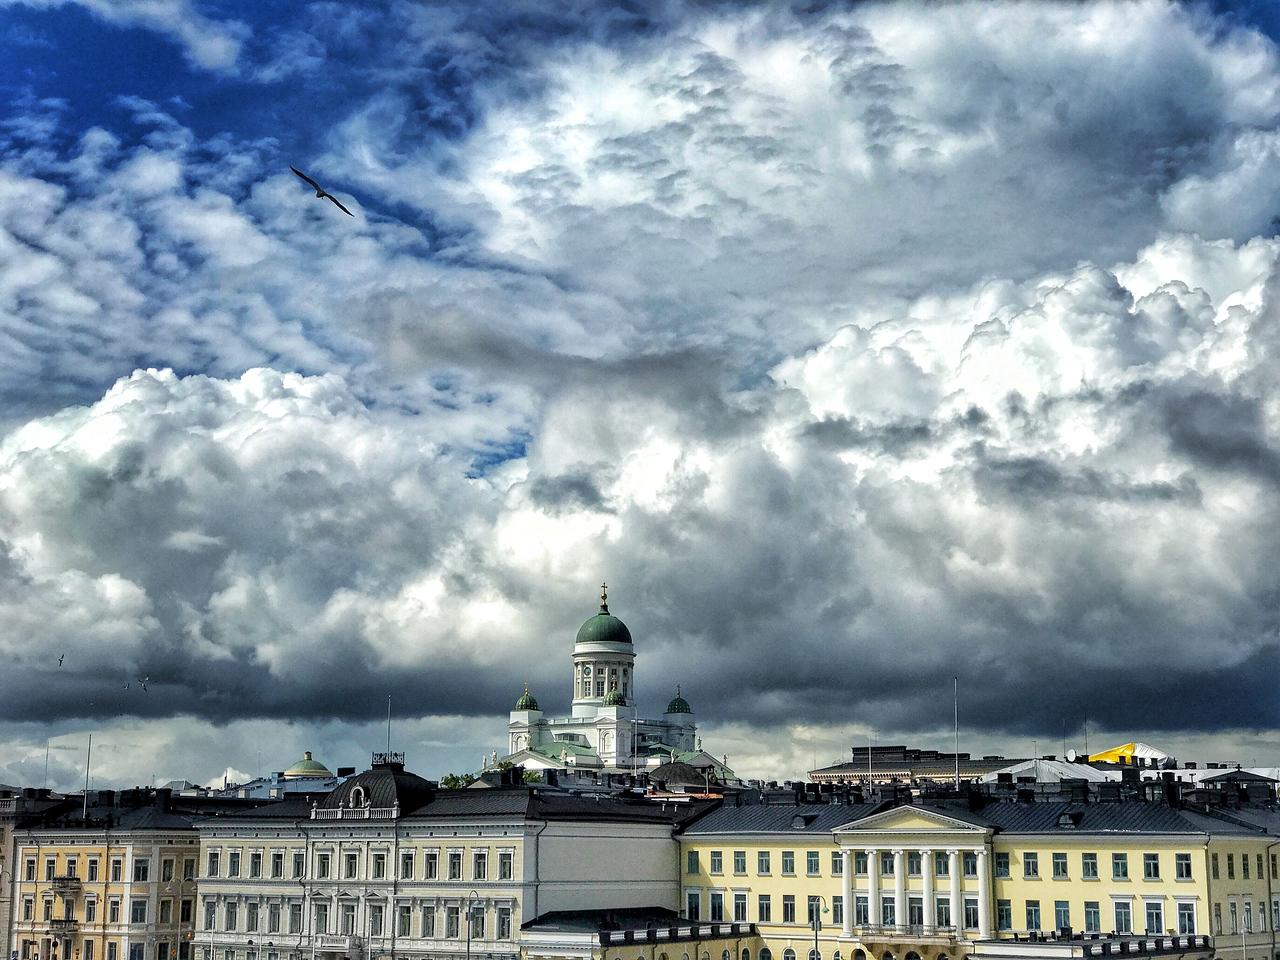 Tuesday Jul 04 - Helsinki